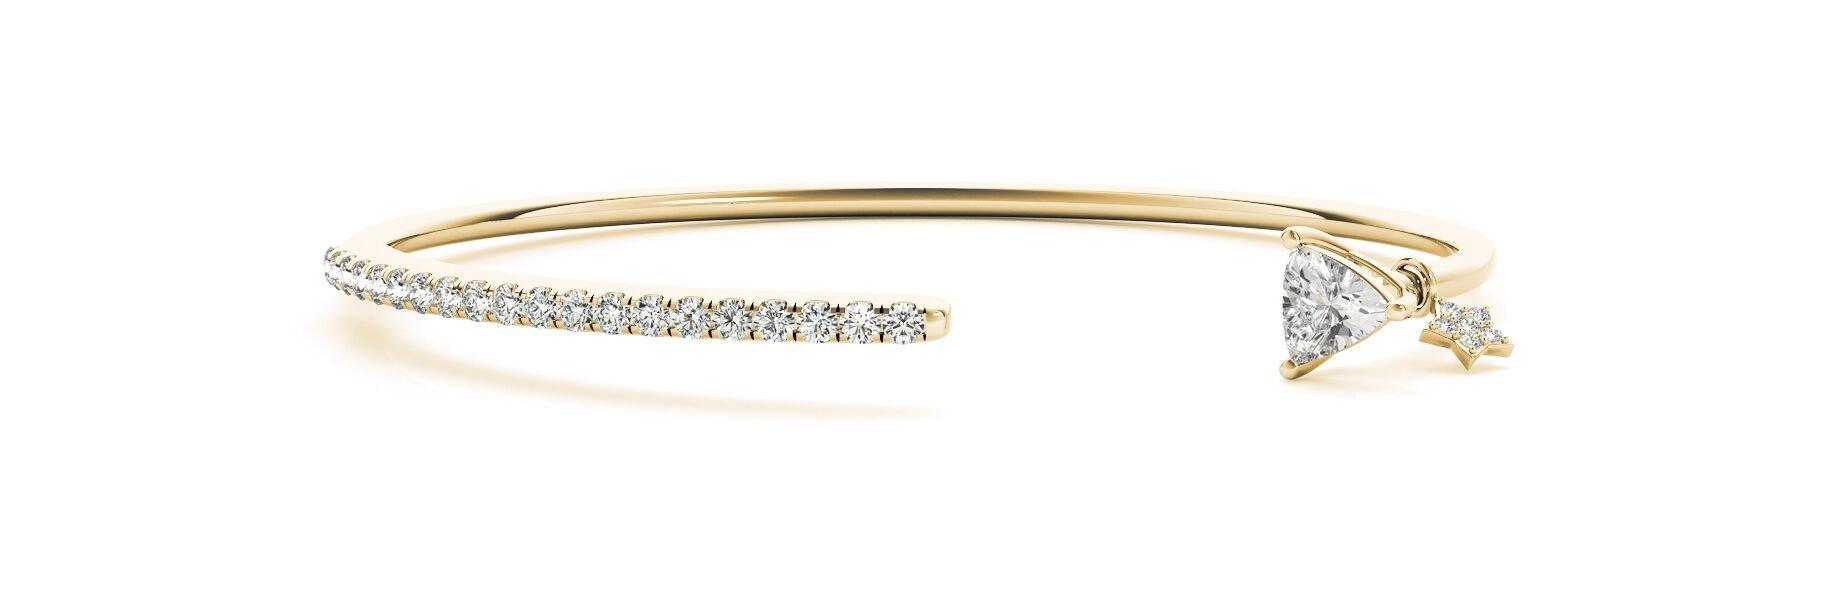 Trillion Diamond Bangle Bracelet